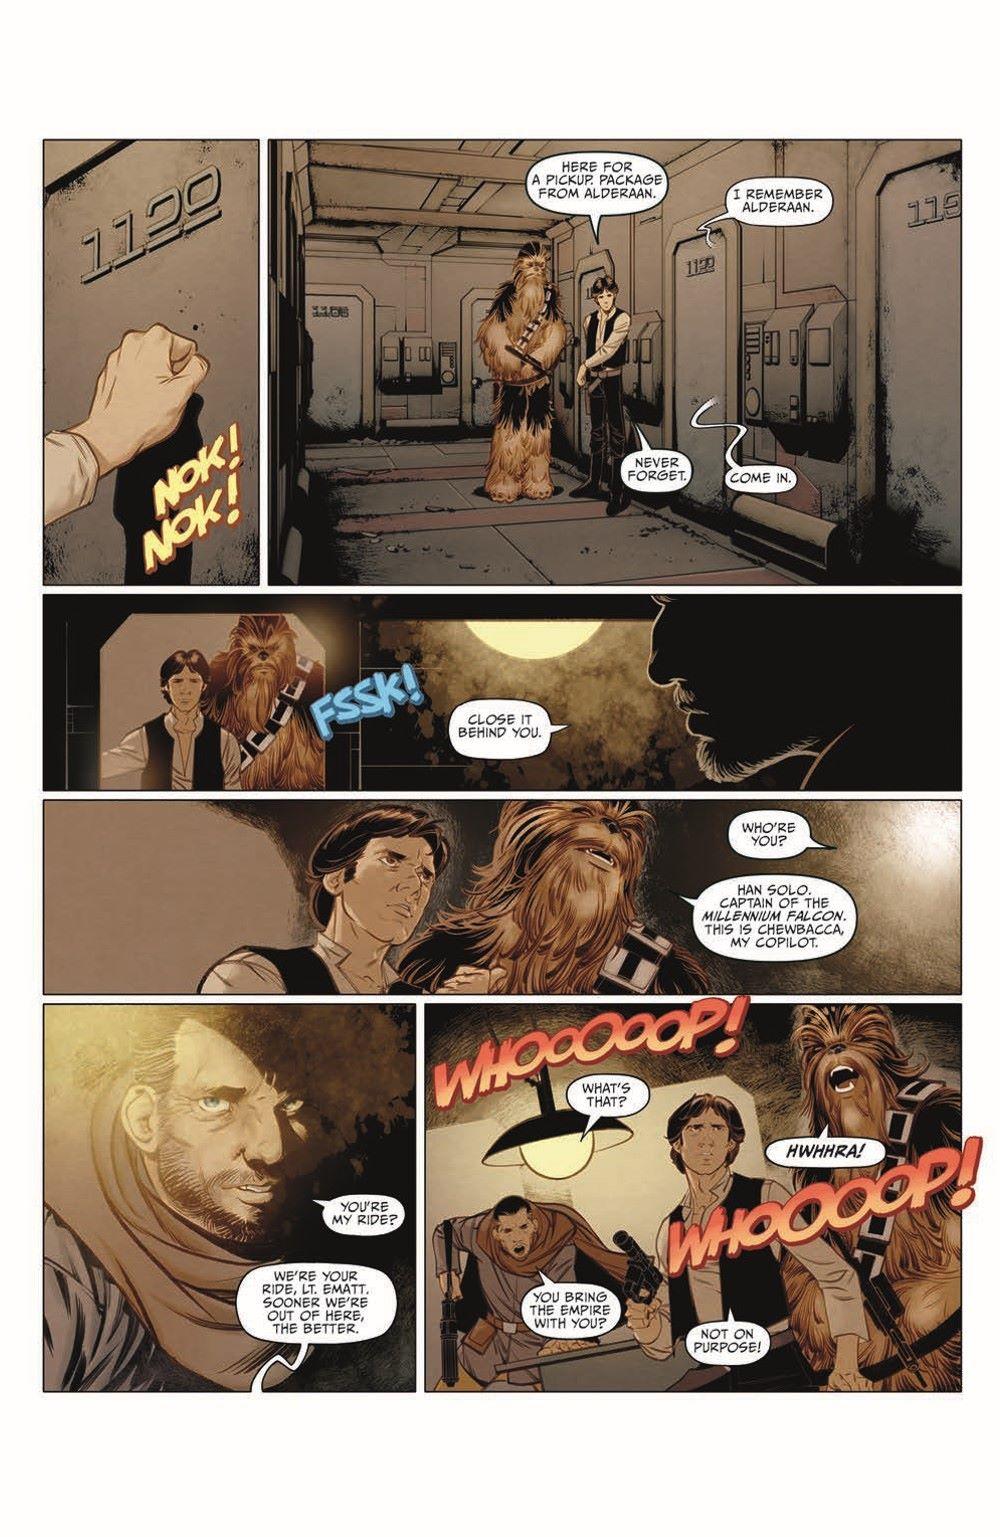 SWA_Smuggler02_pr-6 ComicList Previews: STAR WARS ADVENTURES SMUGGLER'S RUN #2 (OF 2)